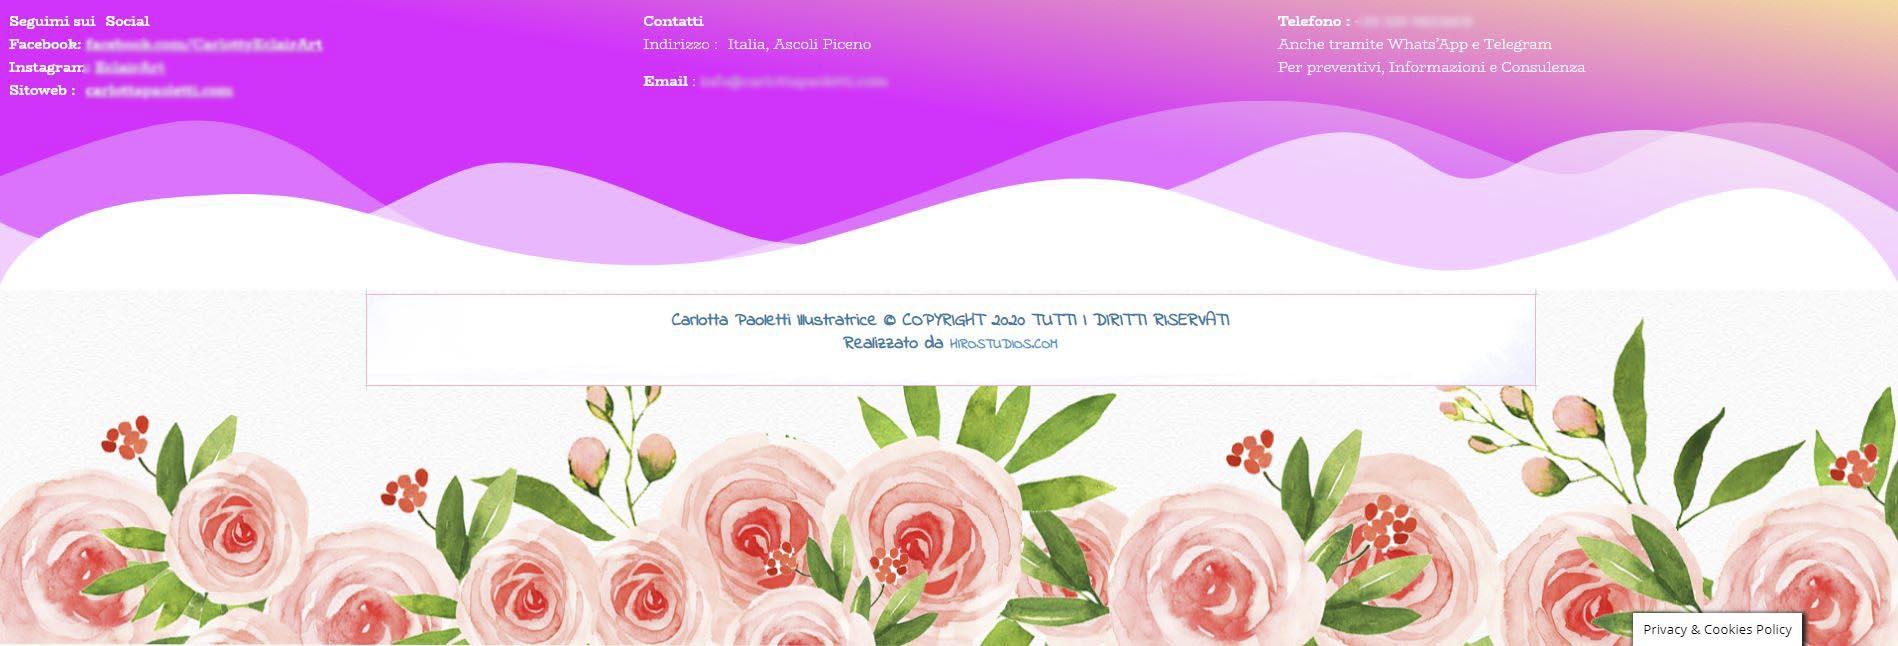 carlotta-paoletti-hirostudios-009